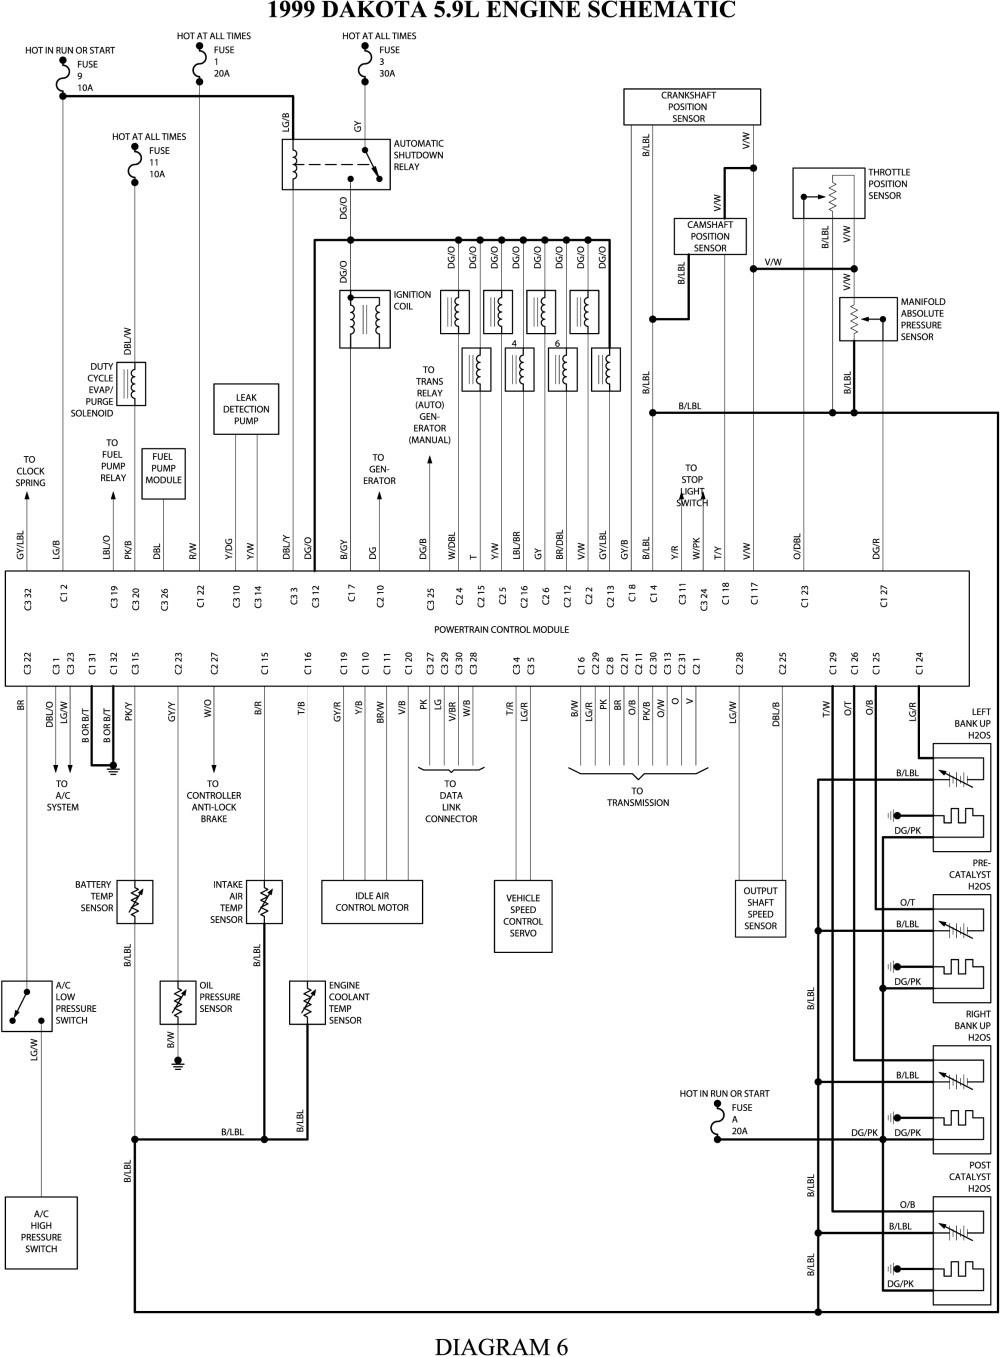 97 Dodge Ram Wiring Diagram - Wiring Diagram Networks